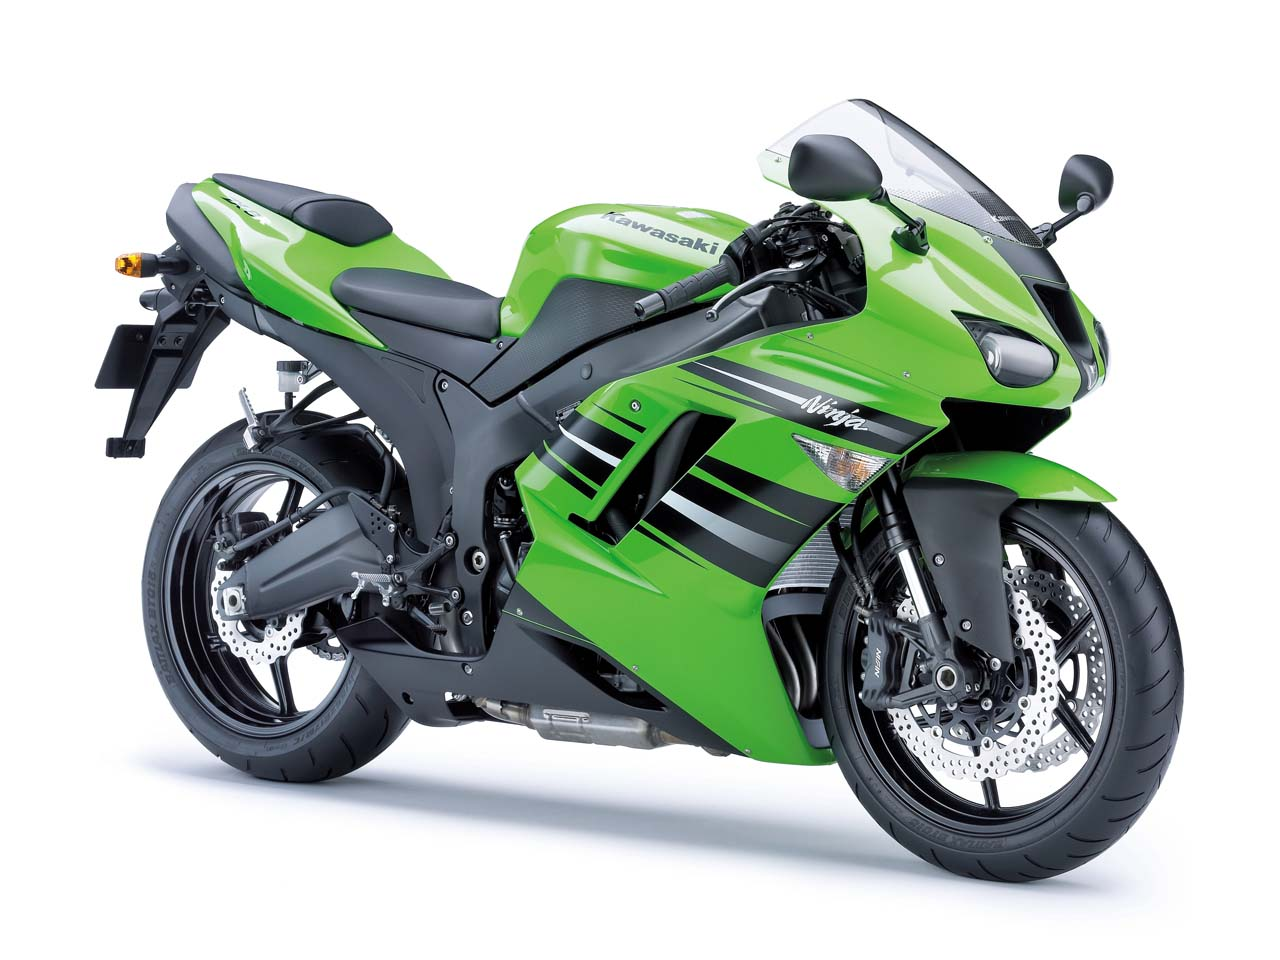 motorcycles kawasaki ninja super sportbike. Black Bedroom Furniture Sets. Home Design Ideas